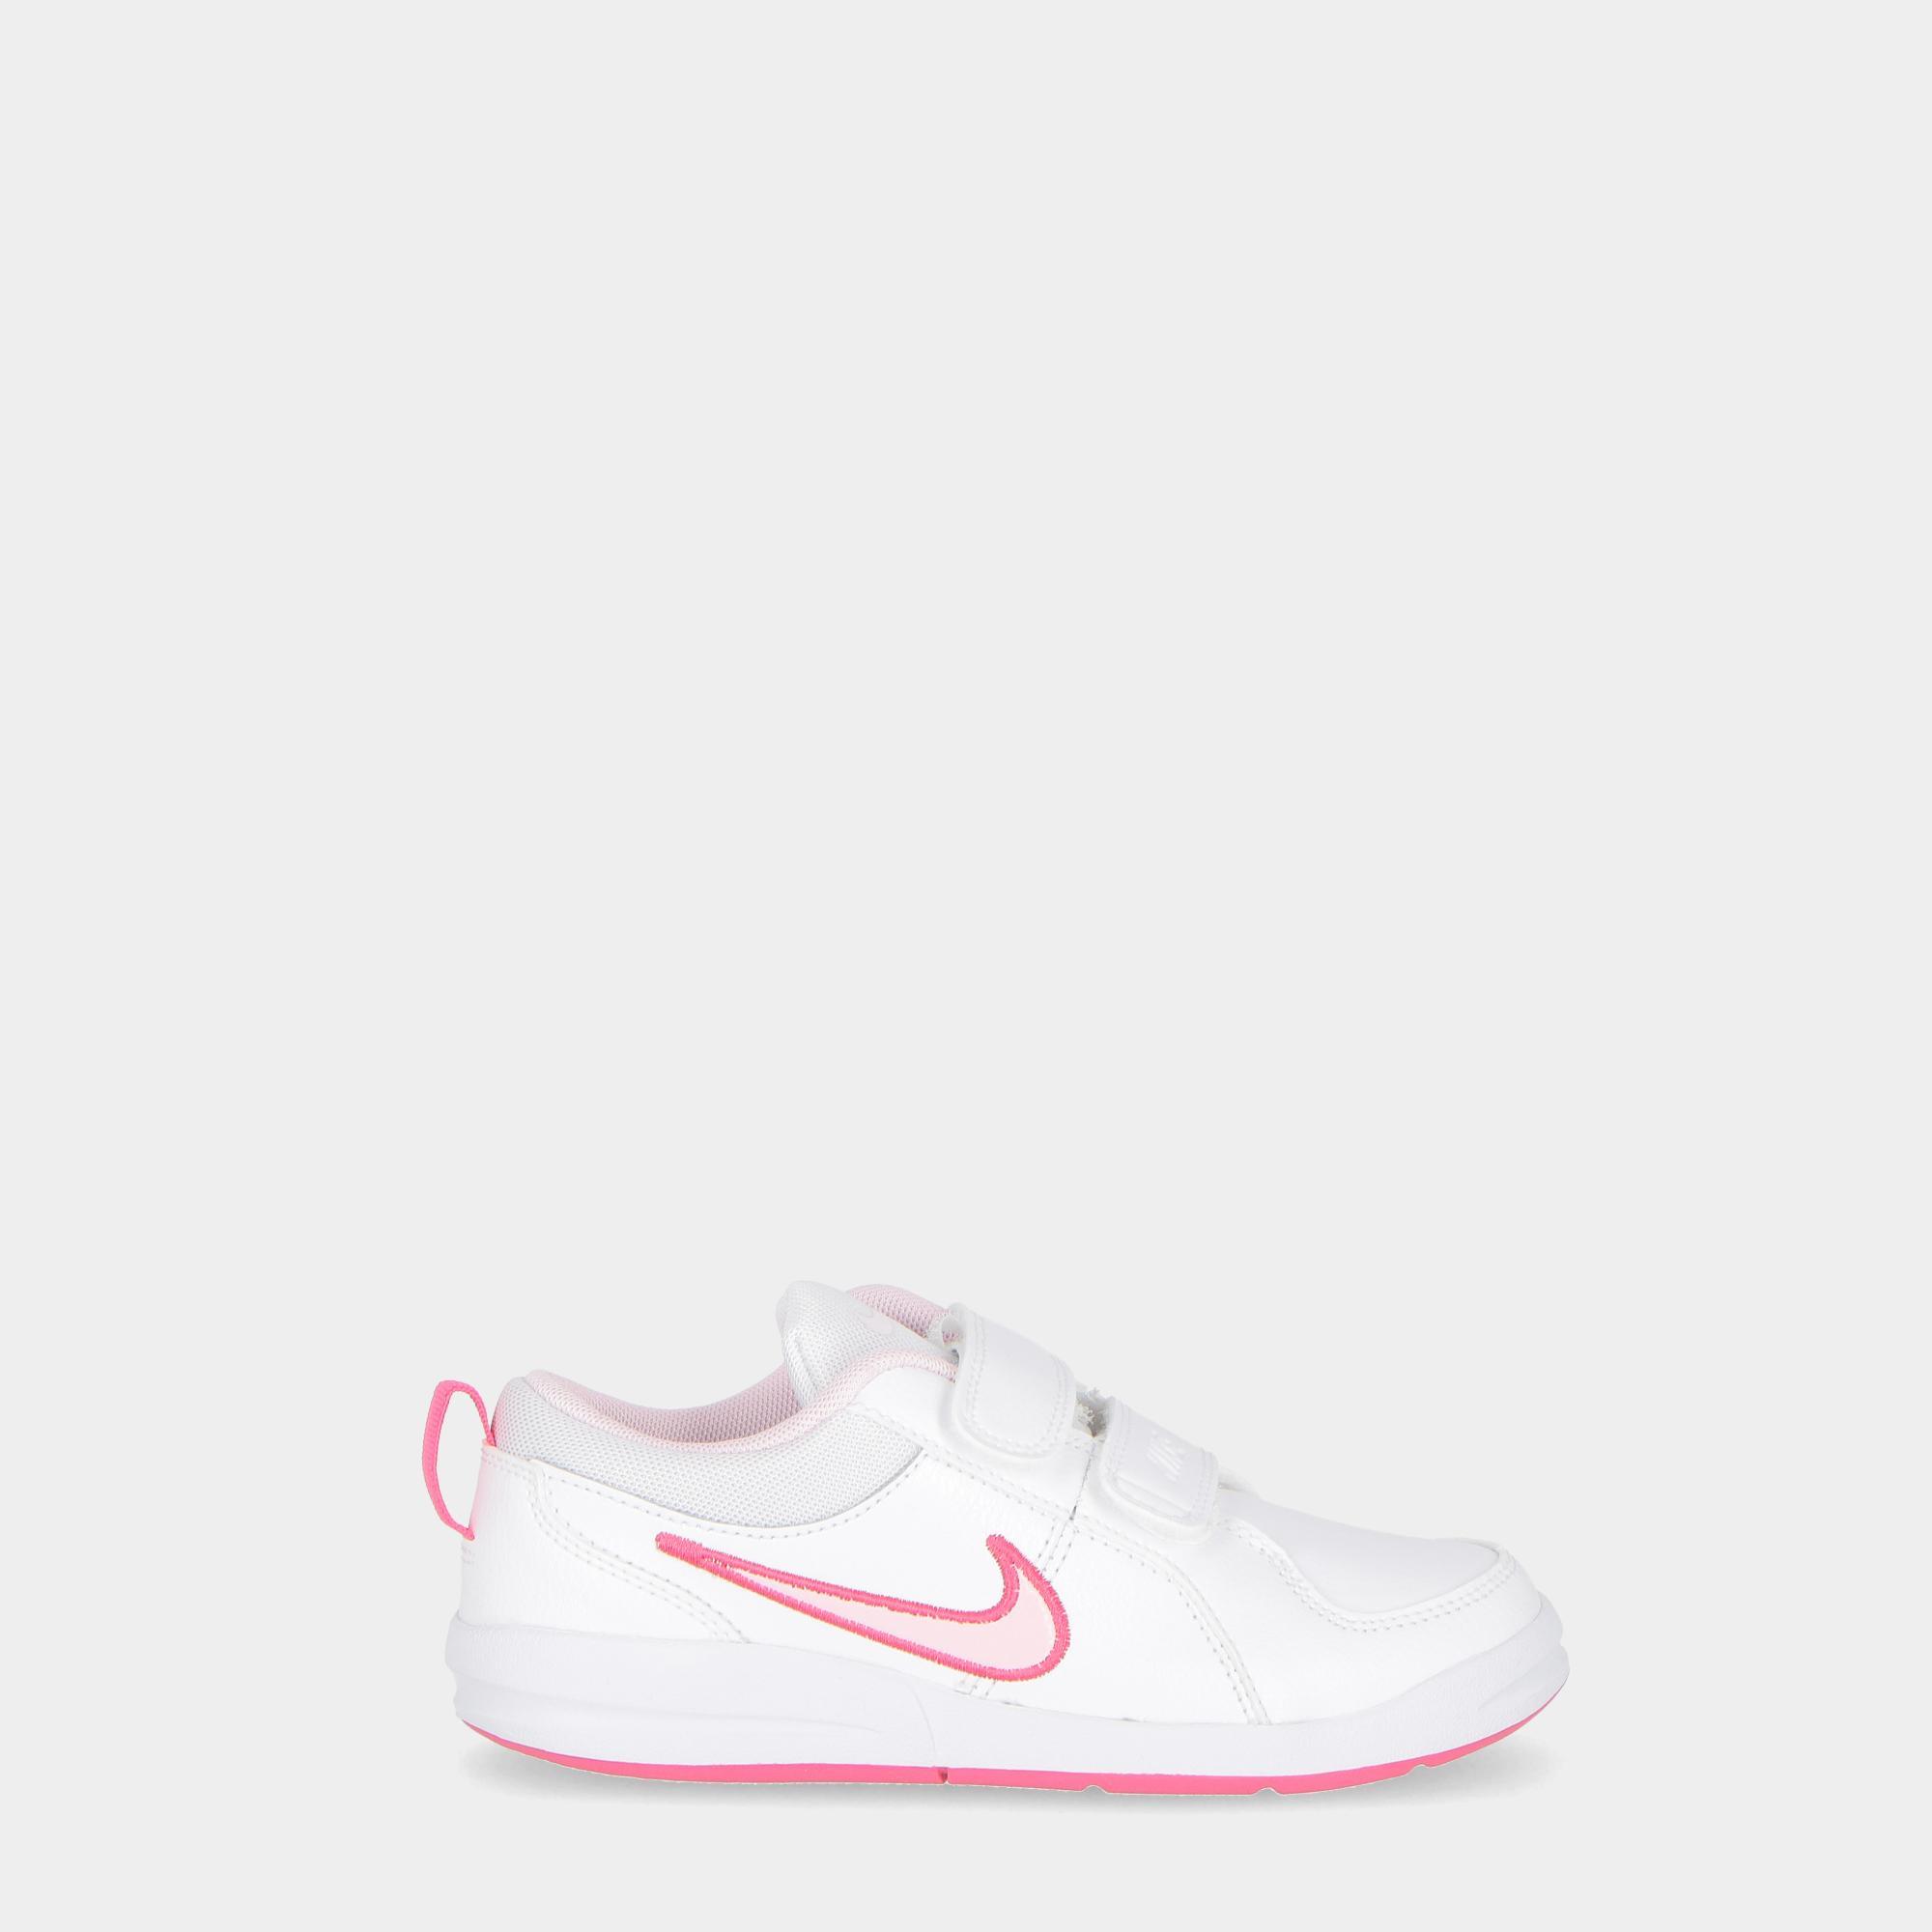 99ec300b10 Nike Pico 4 - Kids White   Treesse